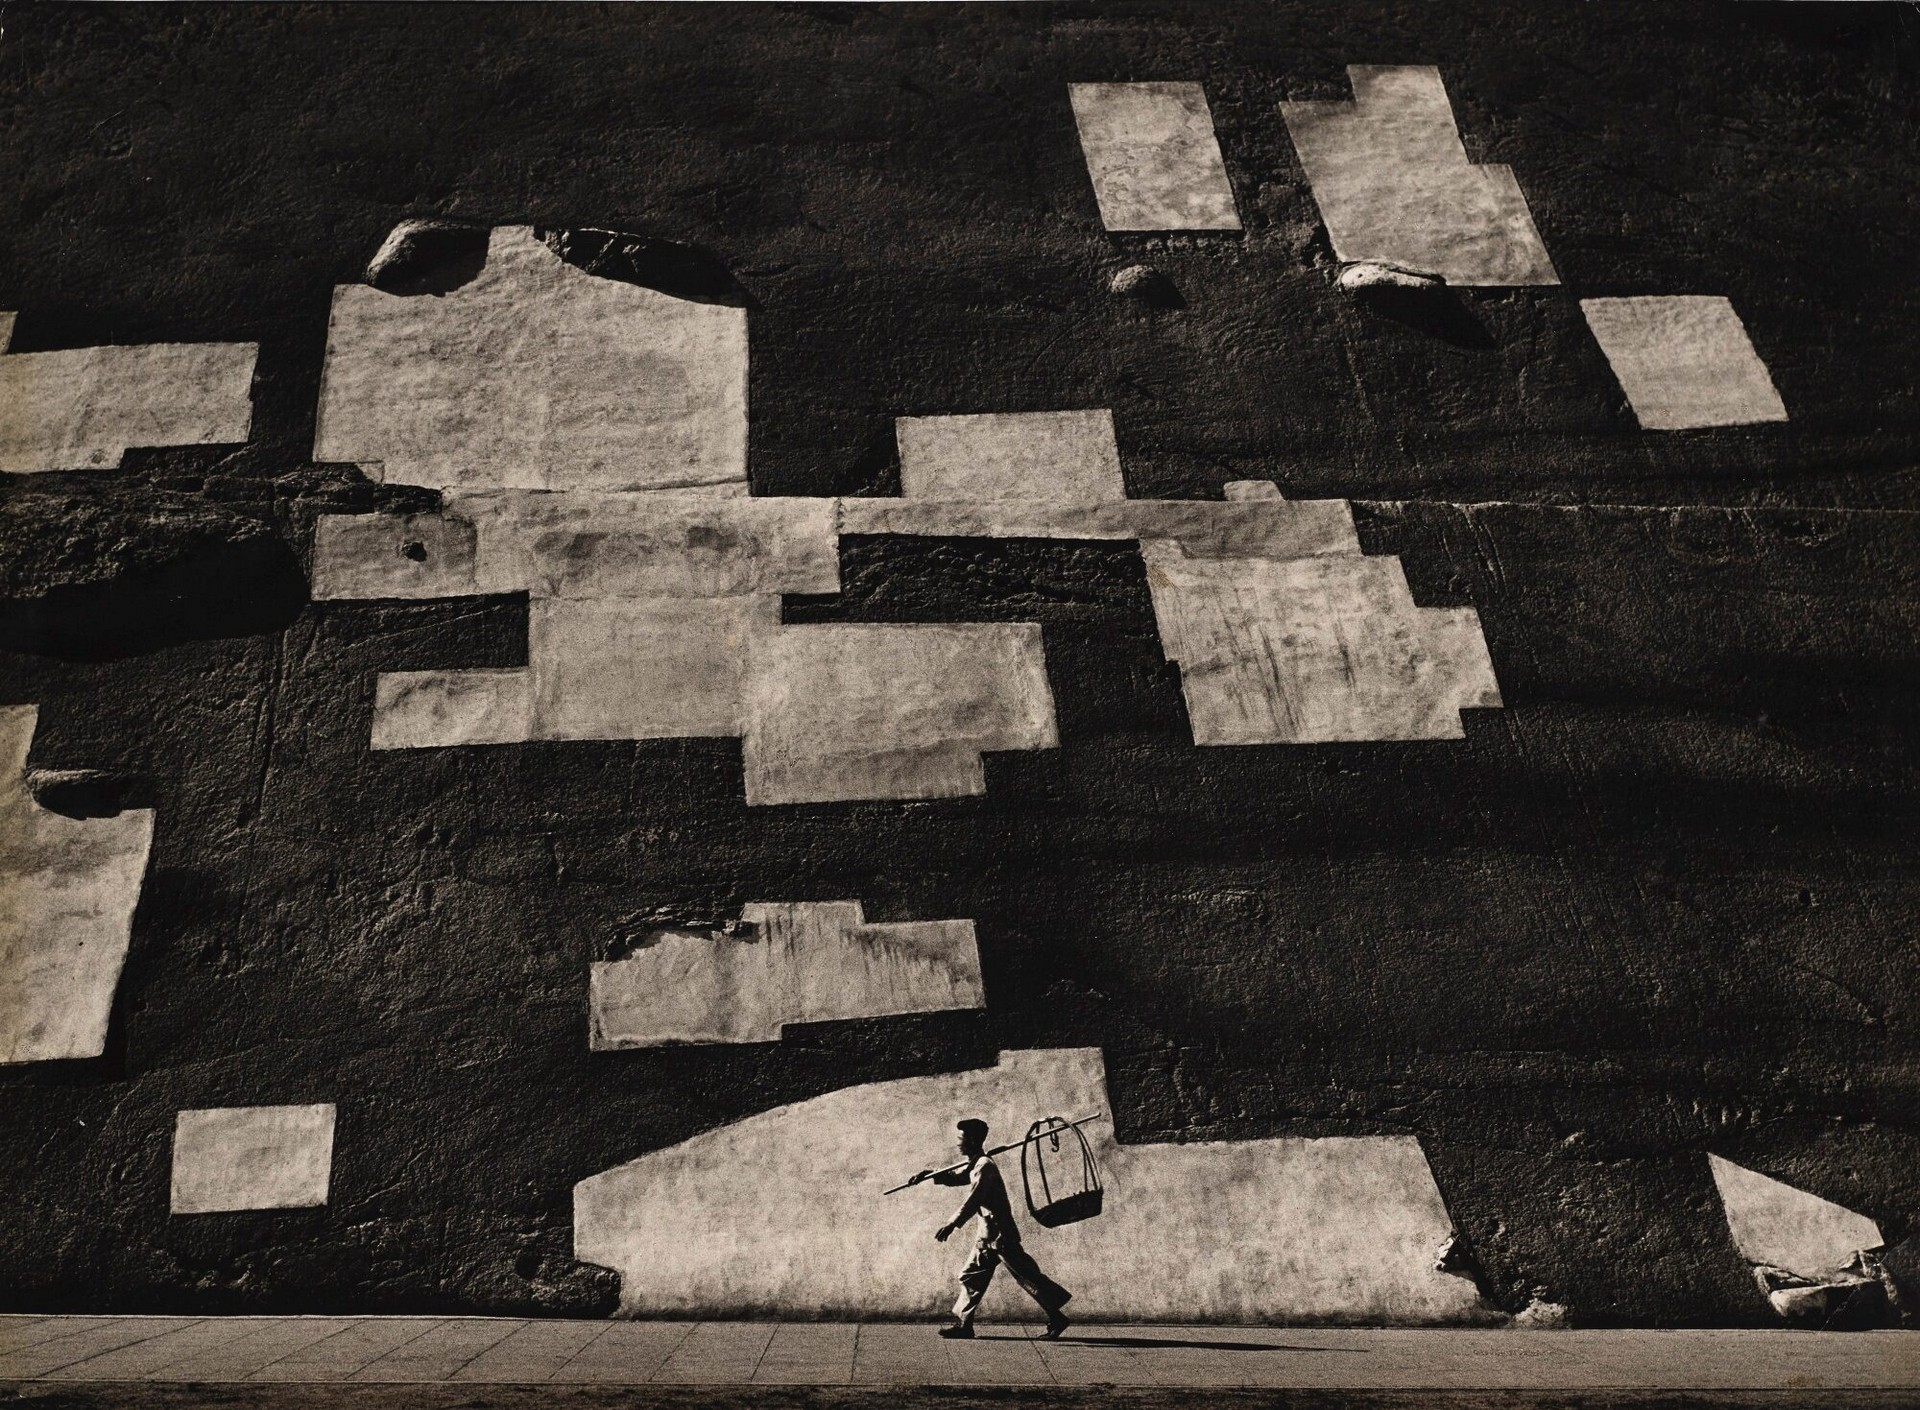 Паттерн, Гонконг, 1956. Автор Фан Хо